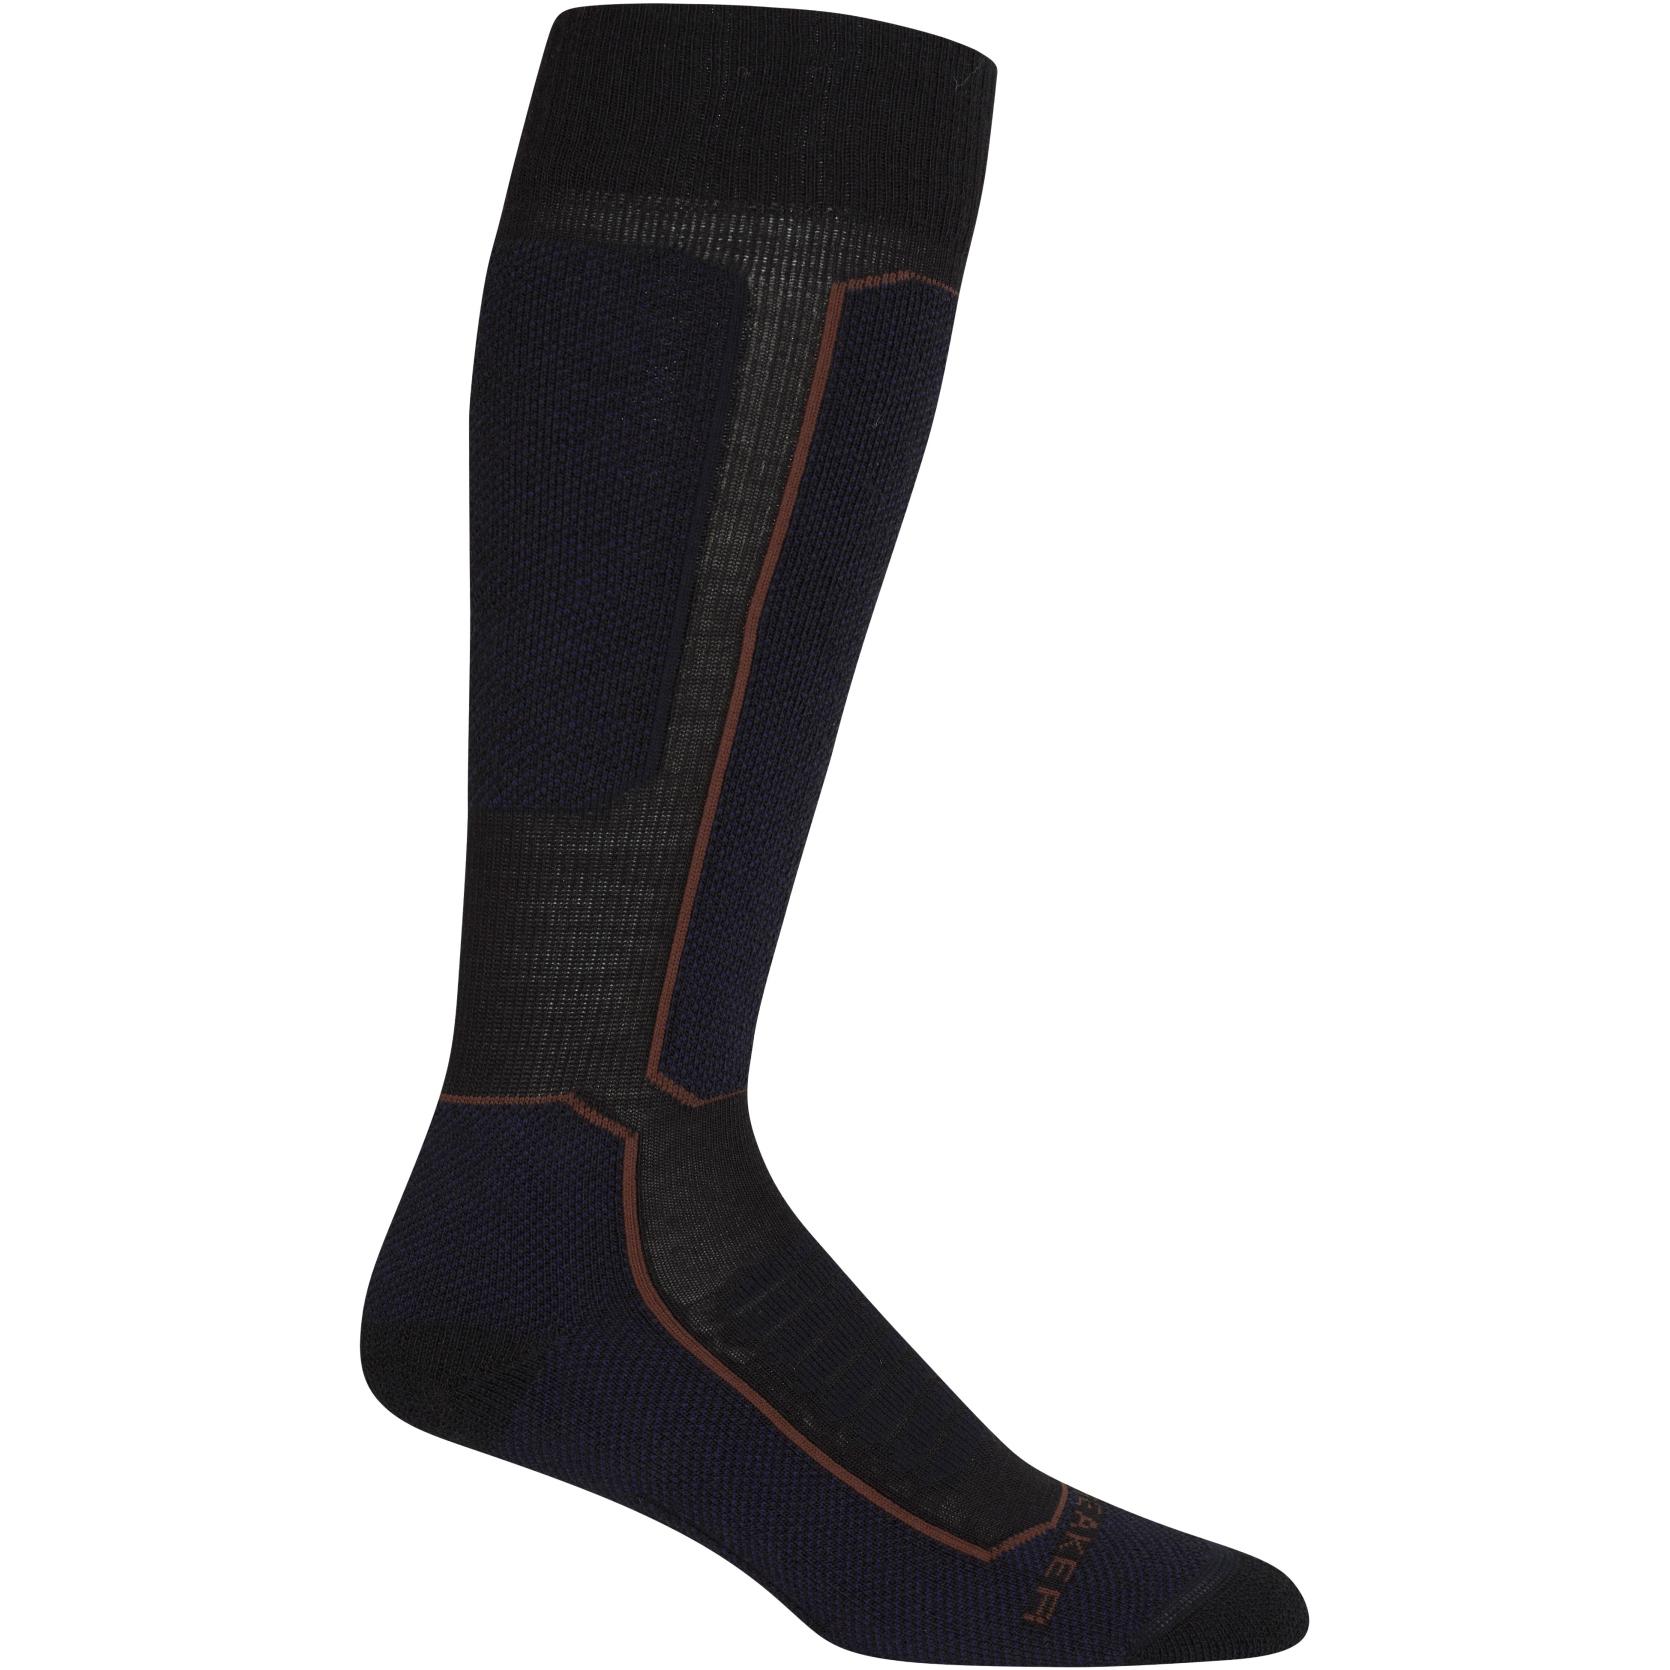 Bild von Icebreaker Ski+ Medium OTC Damen Socken - Black/Royal Navy/Espresso